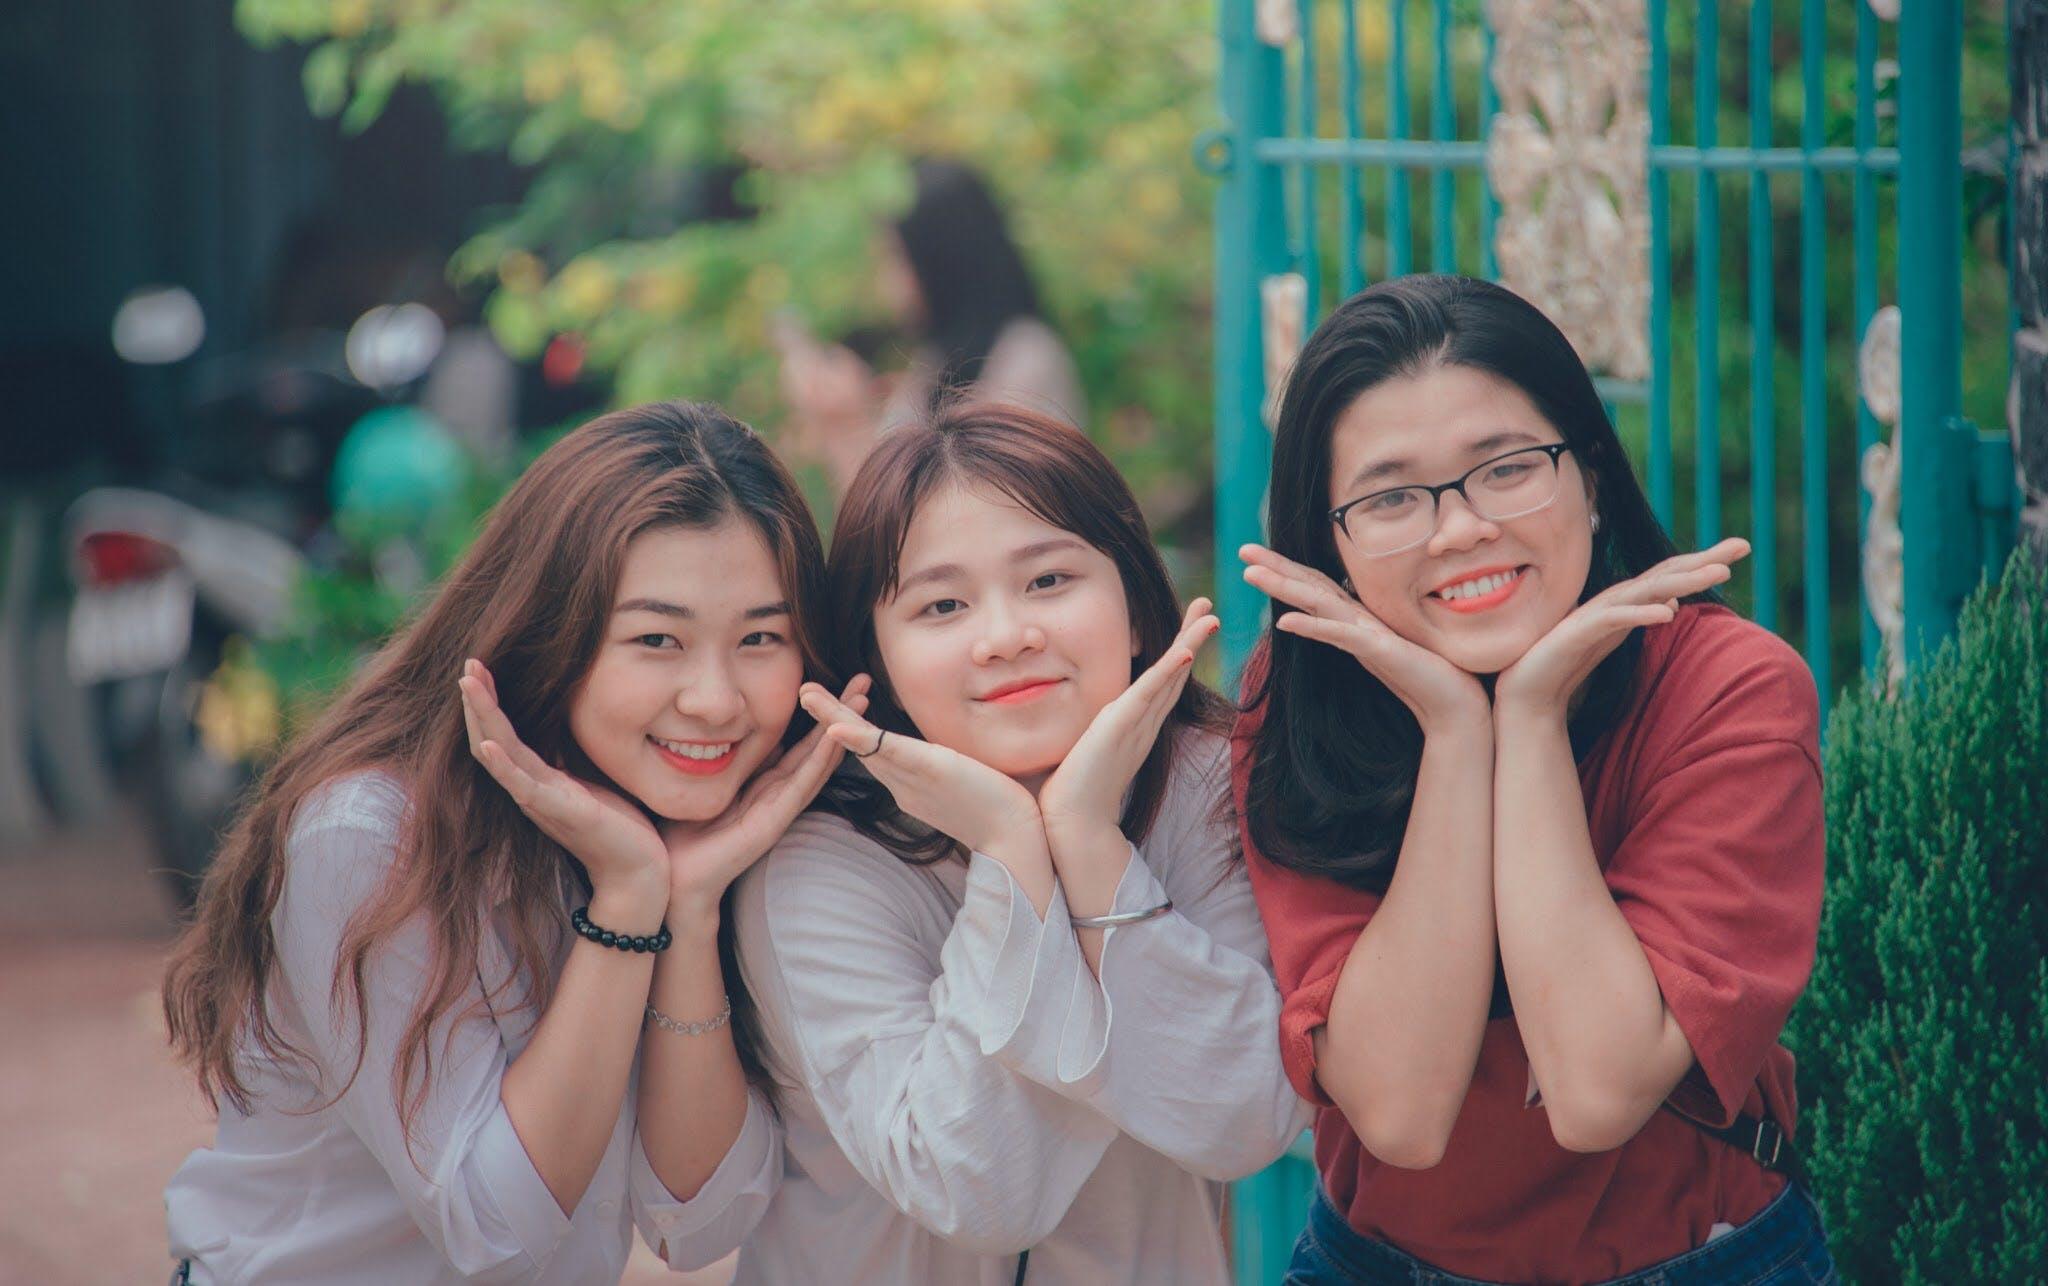 Three Girl's Wearing White and Red Dress Shirts